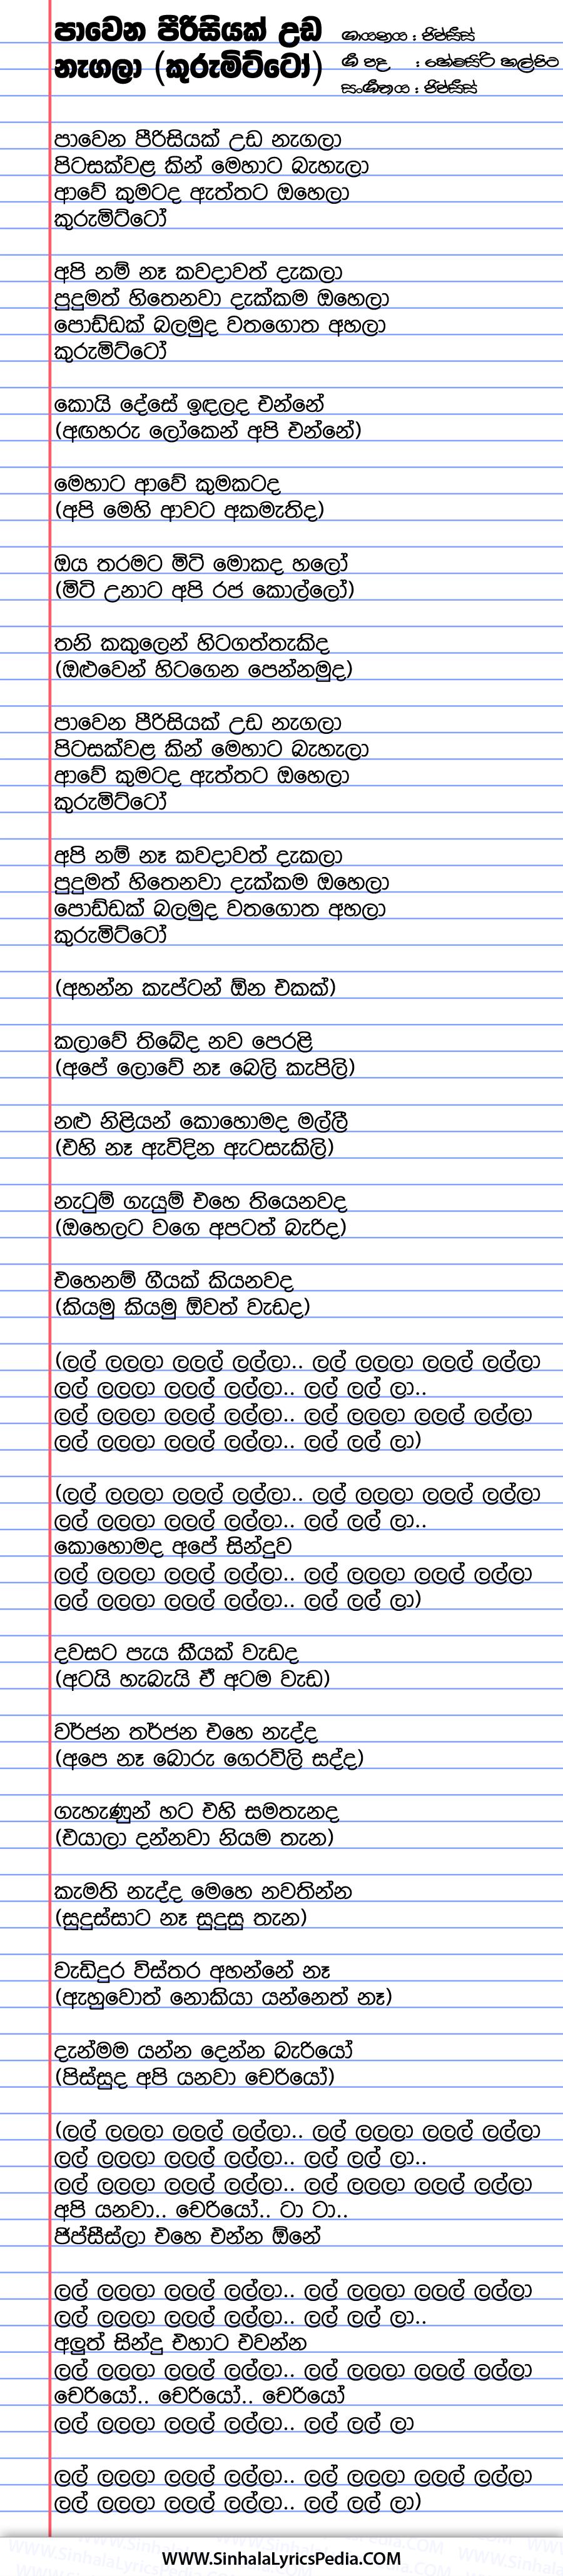 Pawena Pirisiyak Uda Nagala (Kurumitto) Song Lyrics